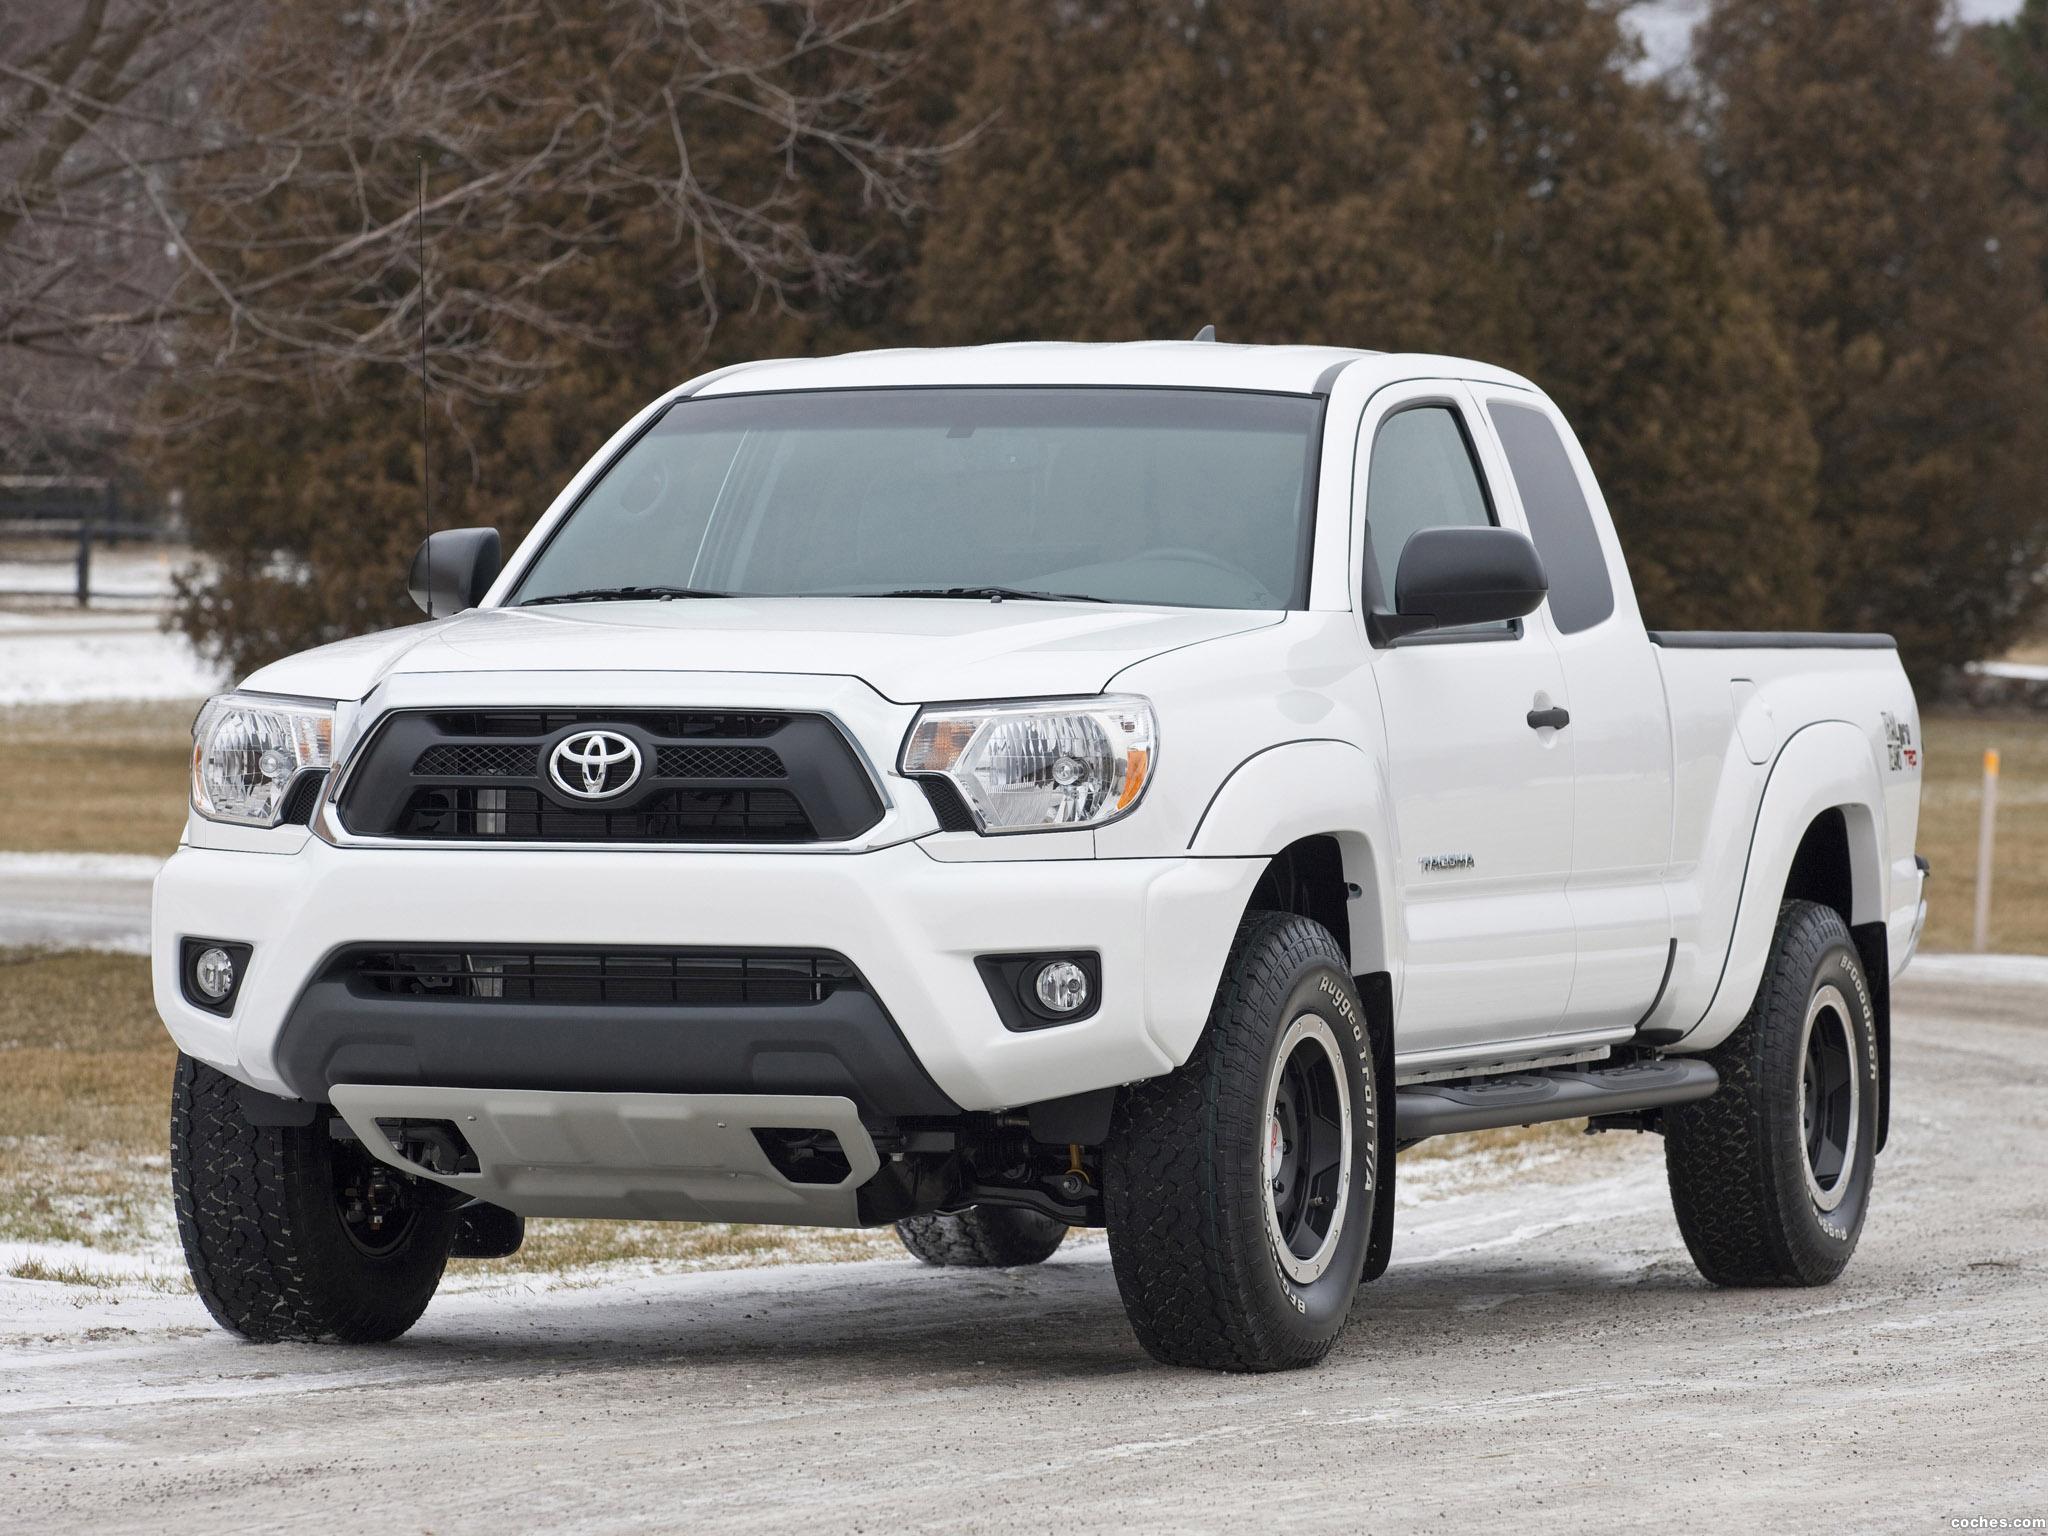 Fotos de Toyota TRD Tacoma Access Cab 2012 | Foto 12